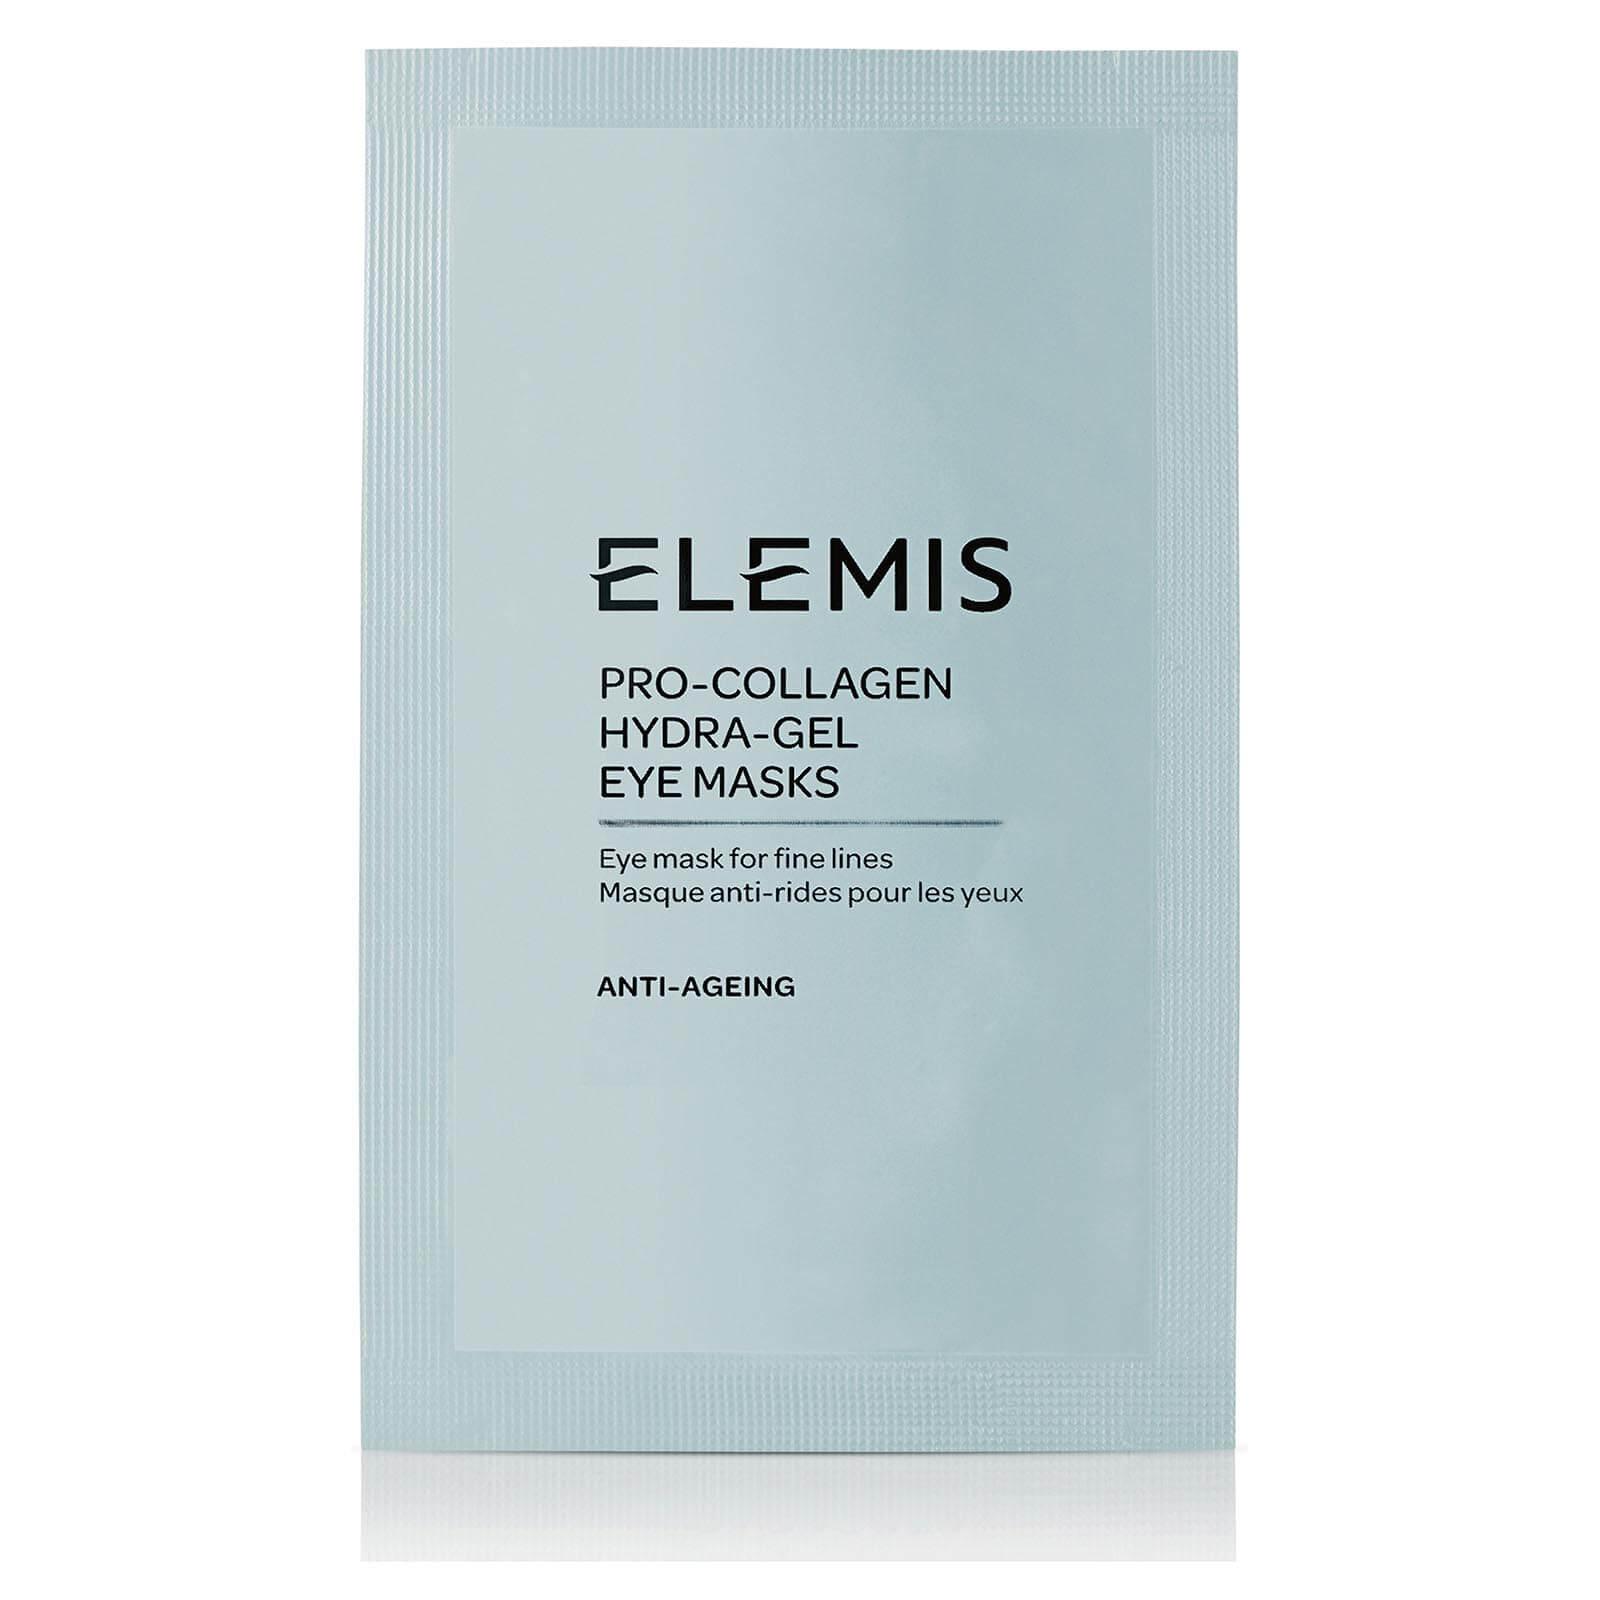 b07b5b77d8612 Elemis Pro-Collagen Hydra-Gel Eye Mask (Pack of 6)